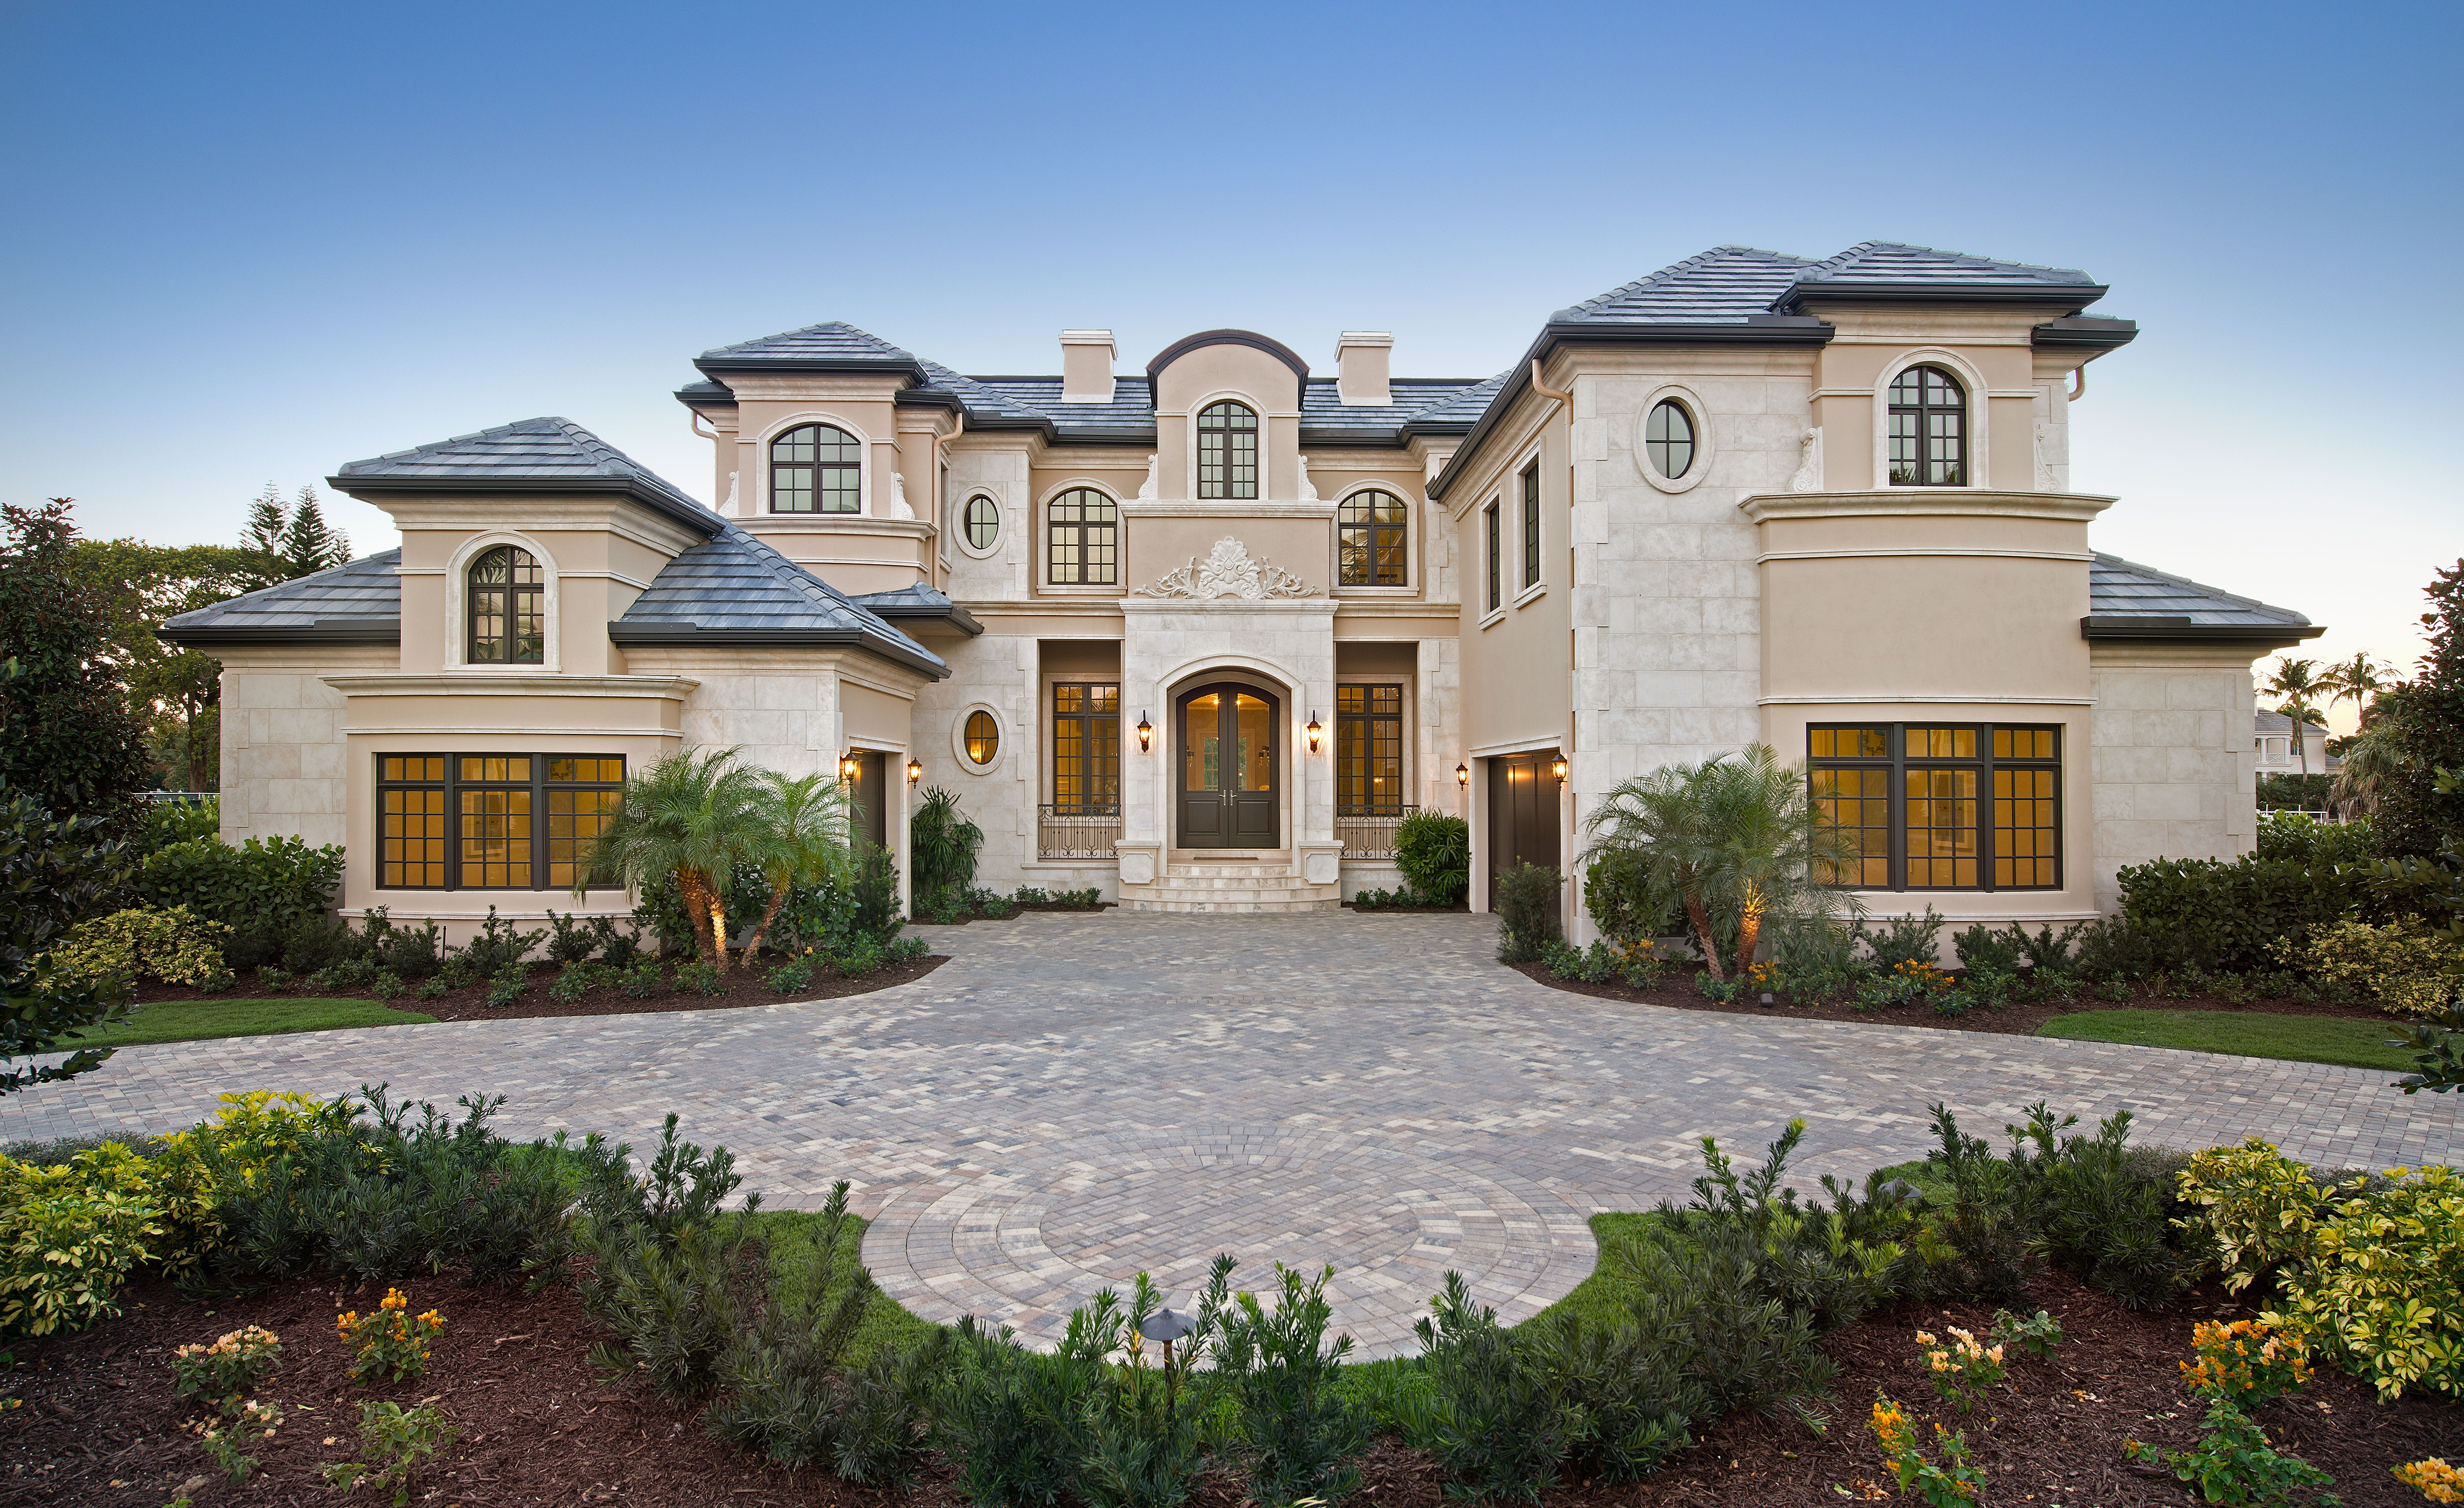 Home Custom Designed By Don Stevenson Design, Inc. U0026 Lotus Architecture, Inc .